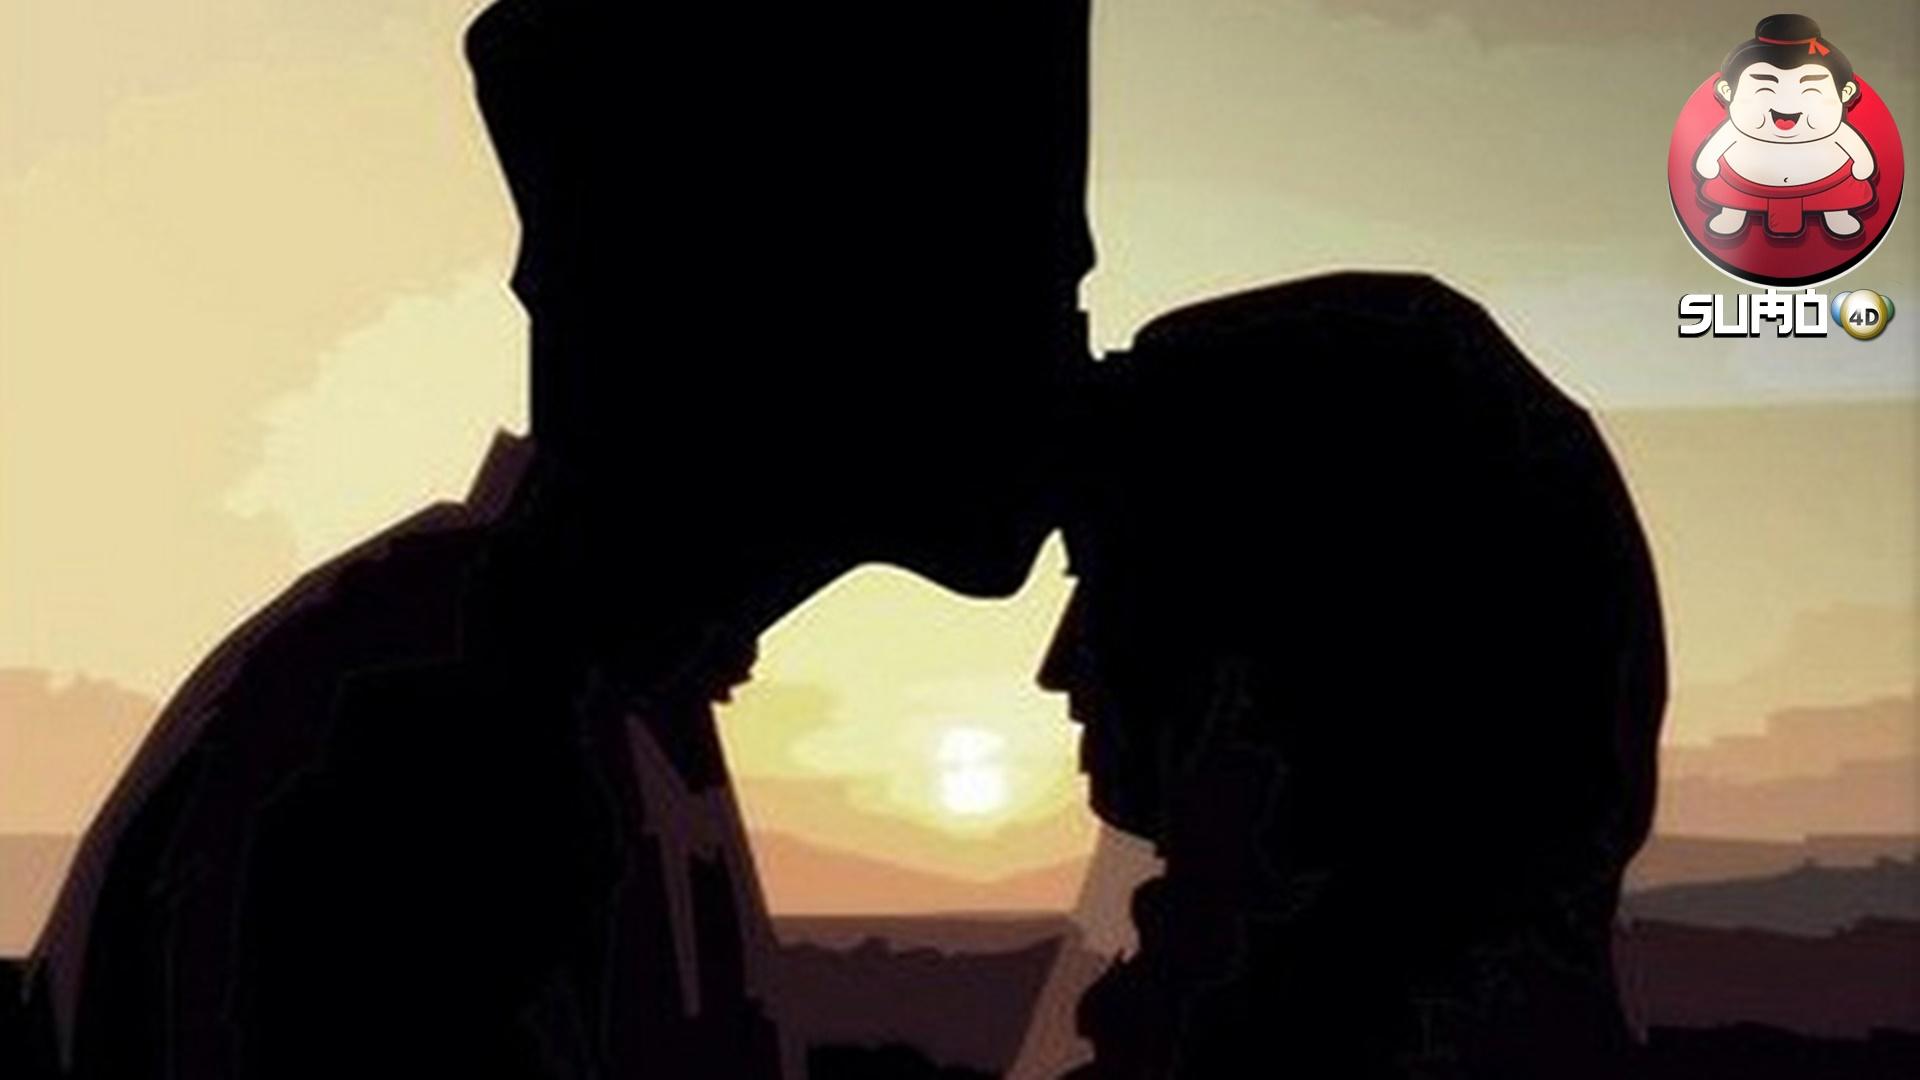 Ilustrasi Pasangan Suami Istri Muslim, Yang Sedang berbulan Madu